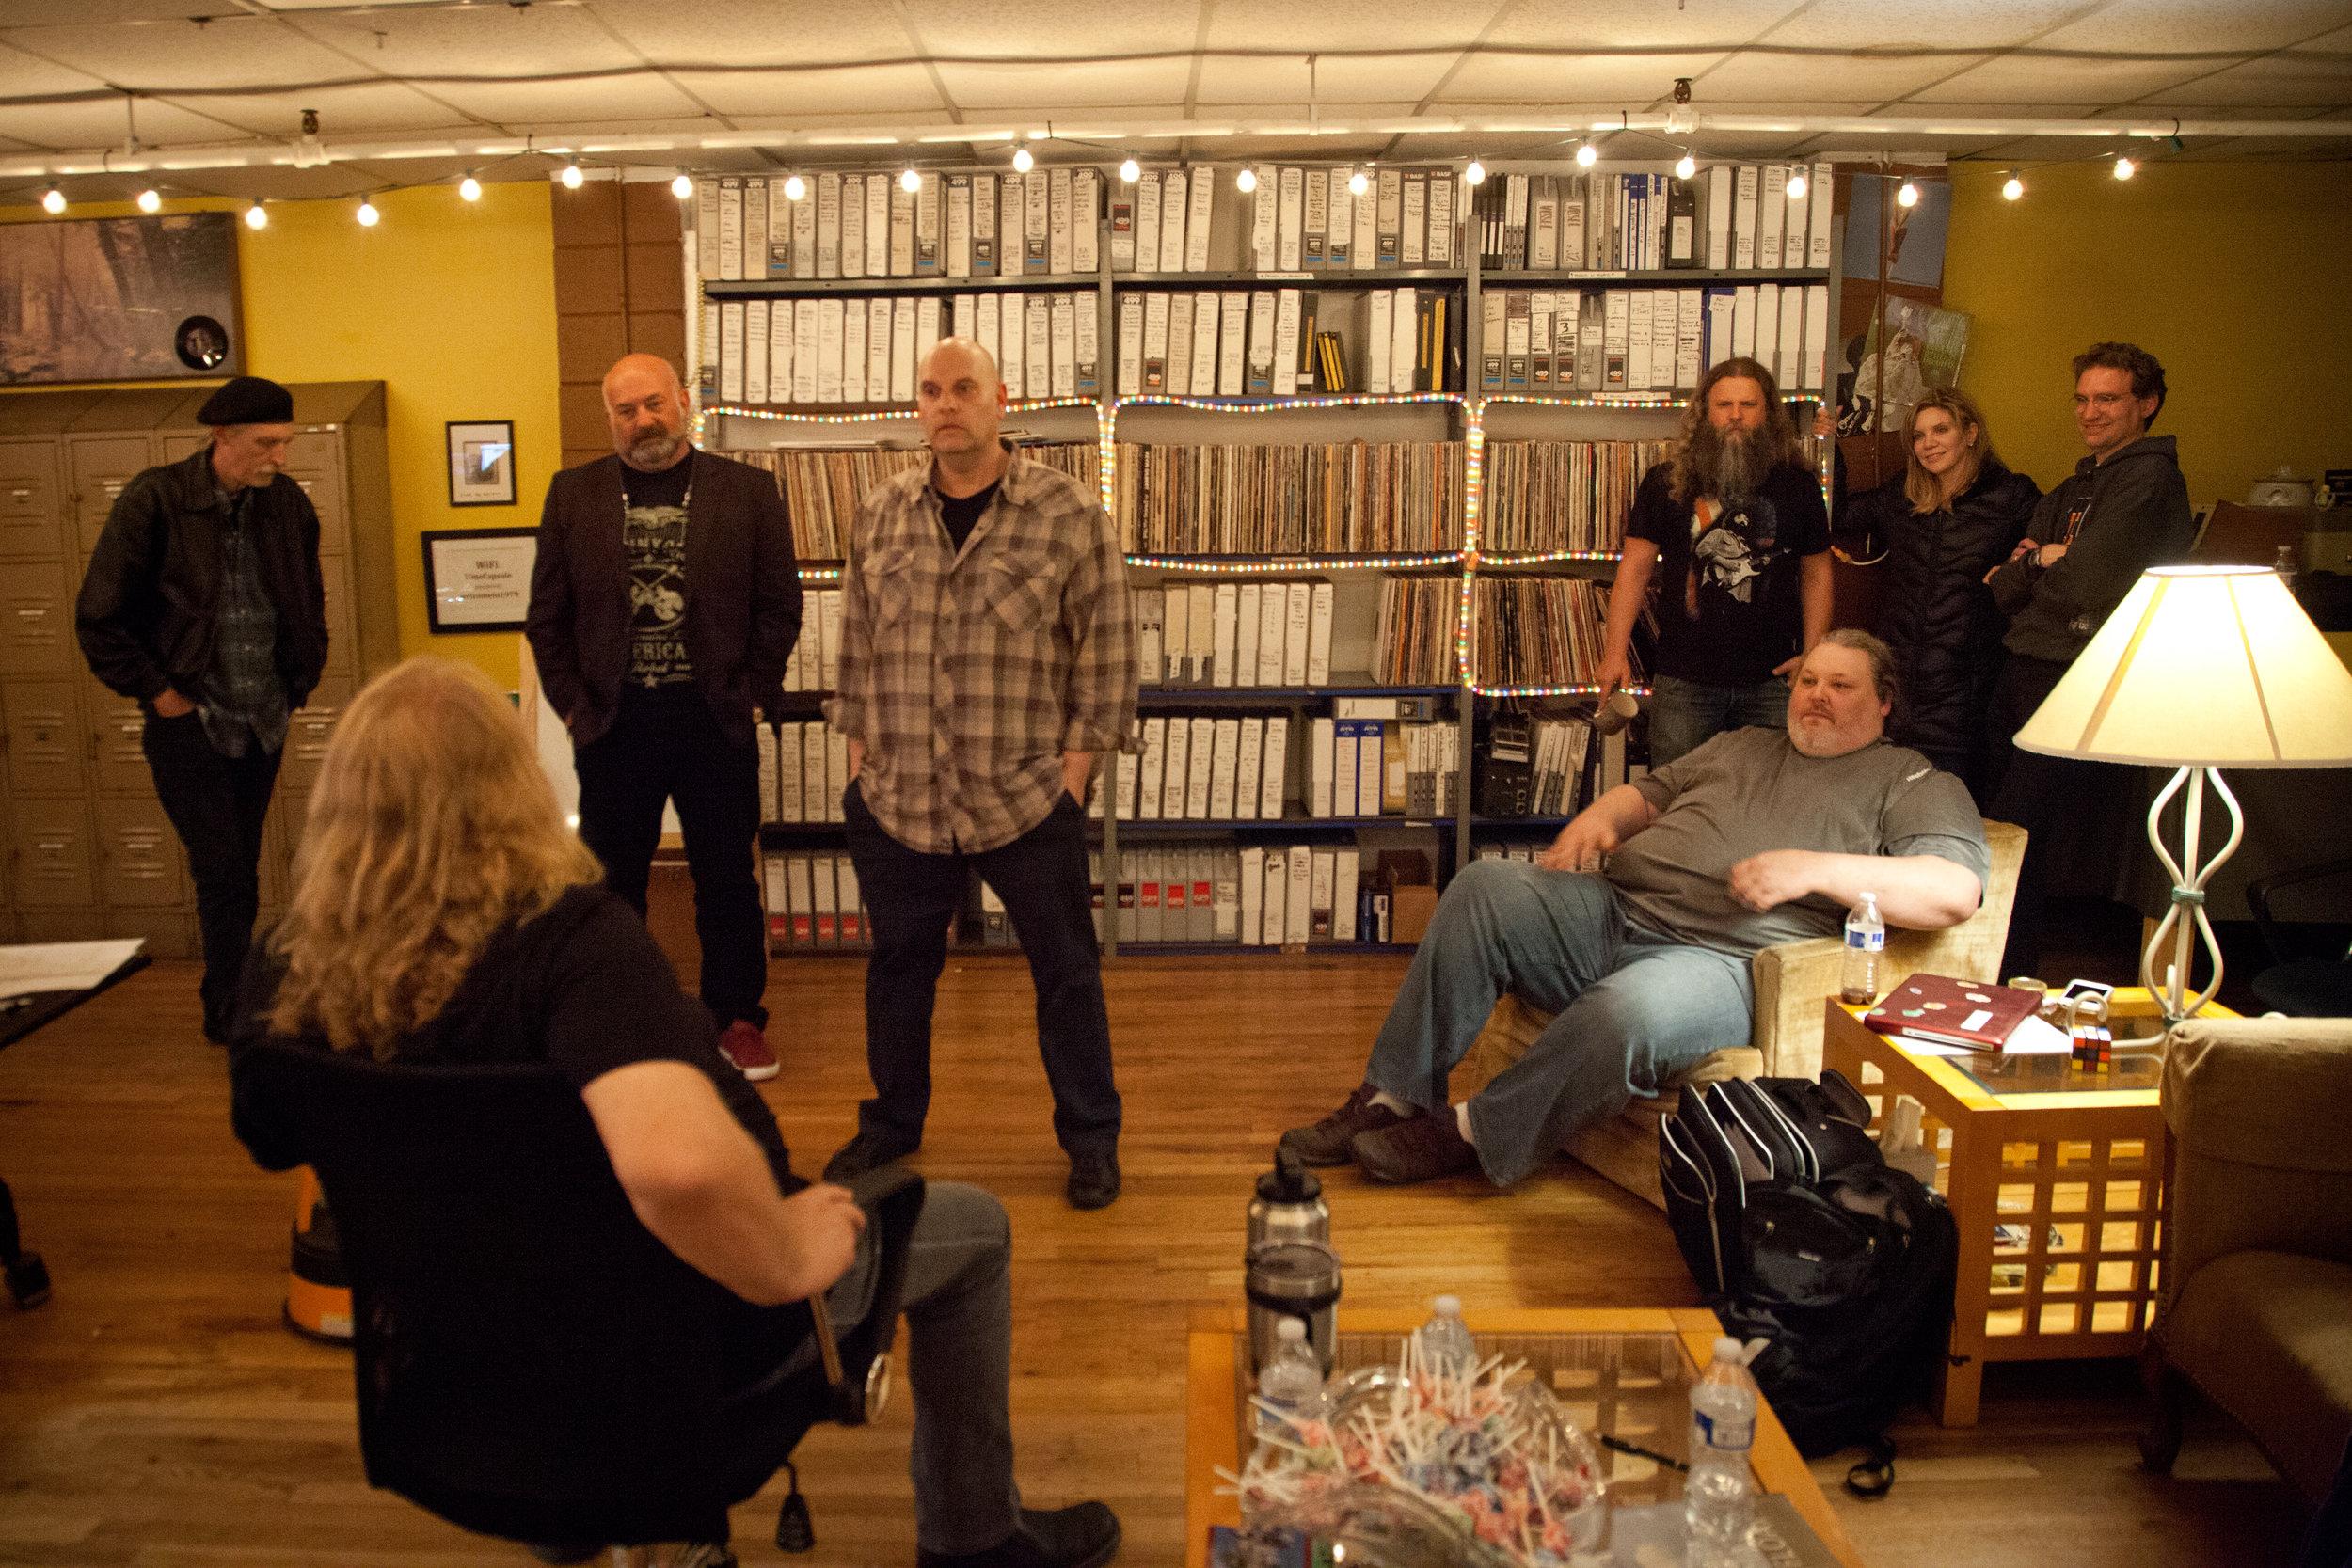 Billy Earheart, Warren Haynes (seated) Tom Siering, M. Giovino, Jamey Johnson, TW Cargile (seated) Alison Krauss, Viktor Krauss; Nashville, TN